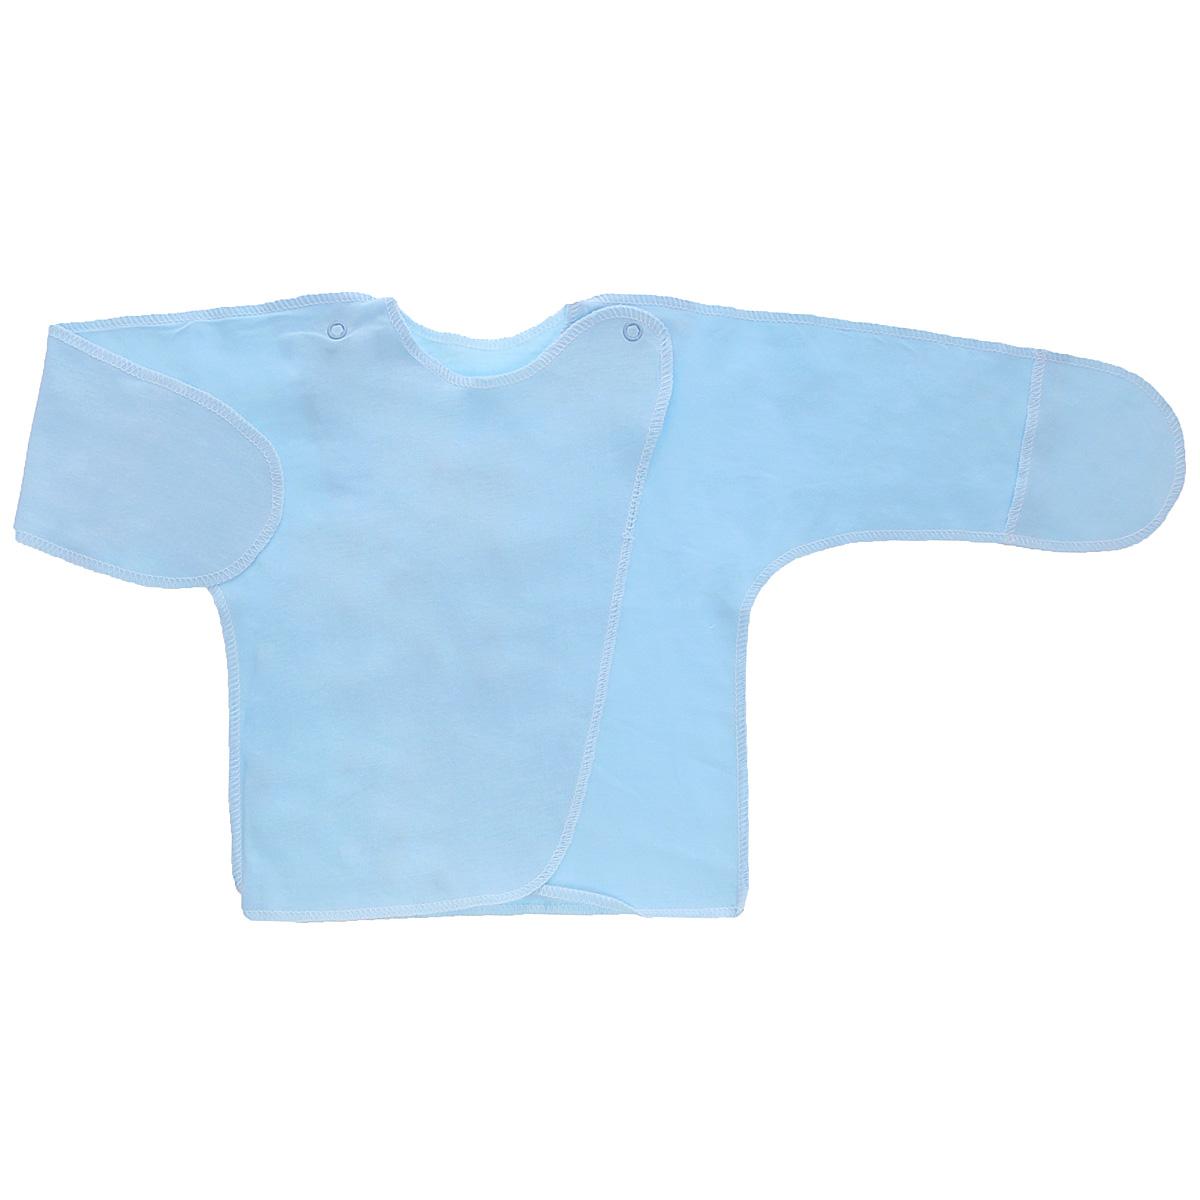 Распашонка Трон-плюс, цвет: голубой. 5003. Размер 50, 0-1 месяц